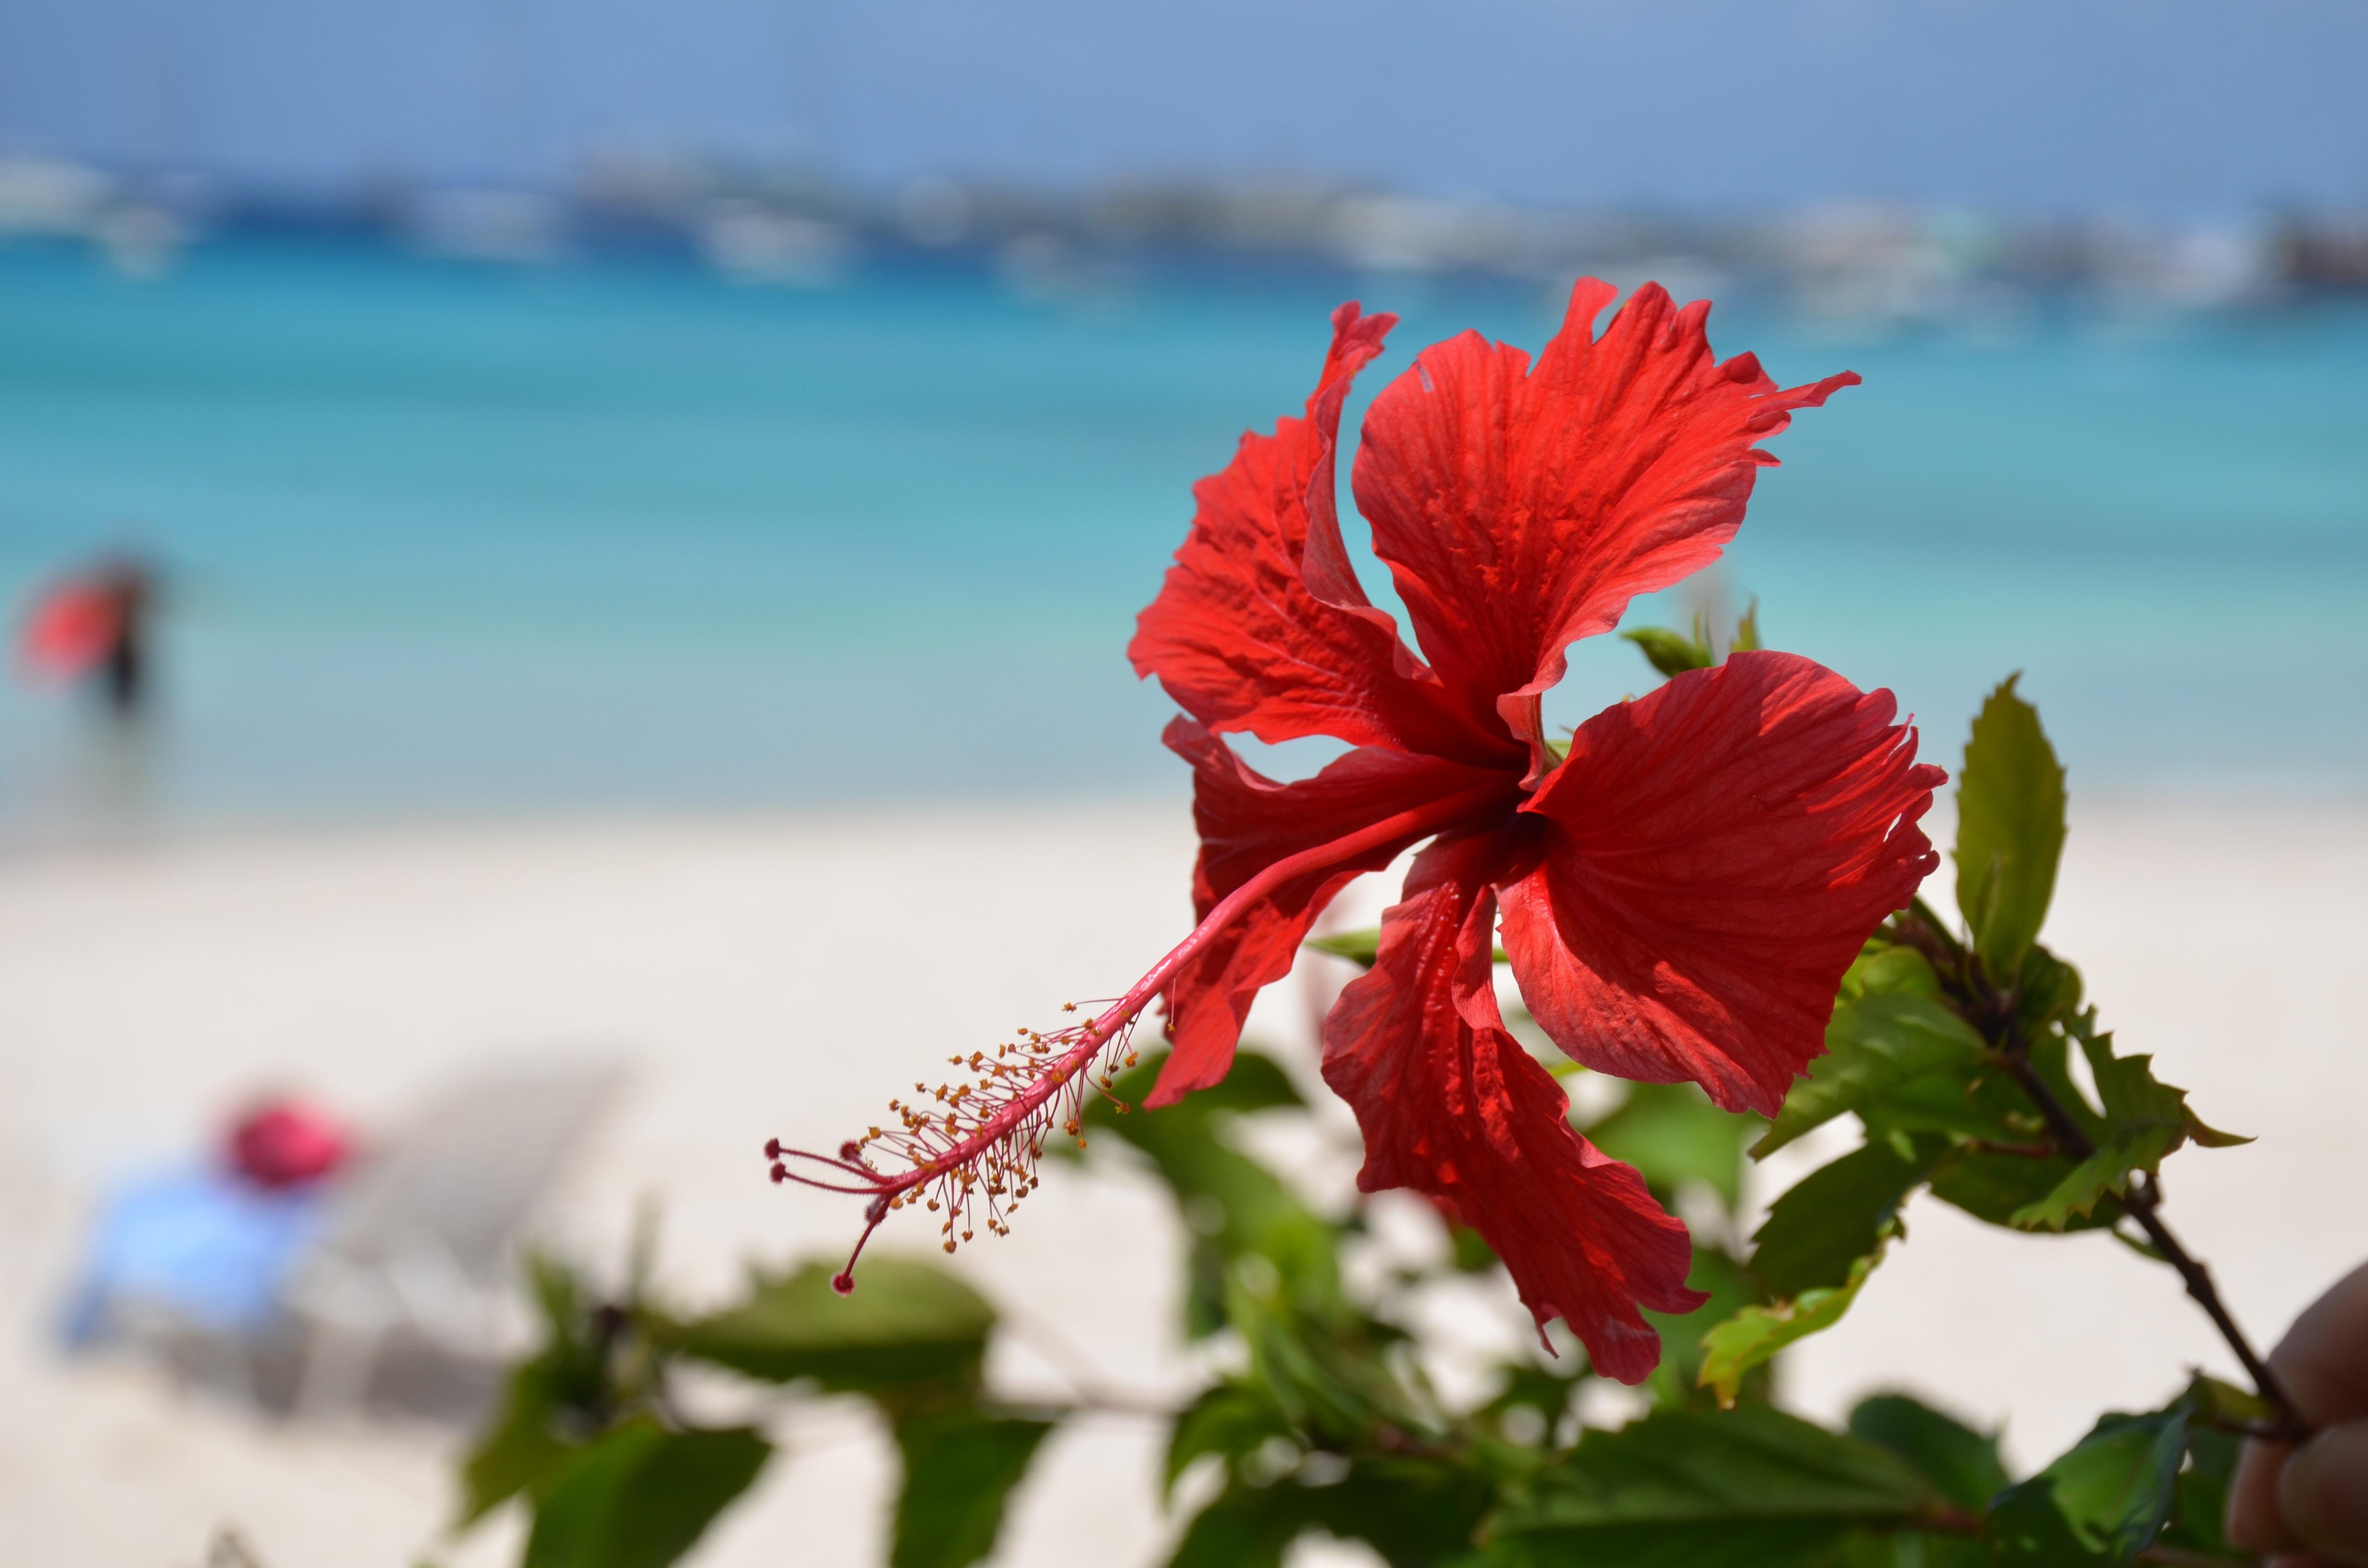 Free Images Sea Nature Sand Blossom Leaf Petal Red Flora